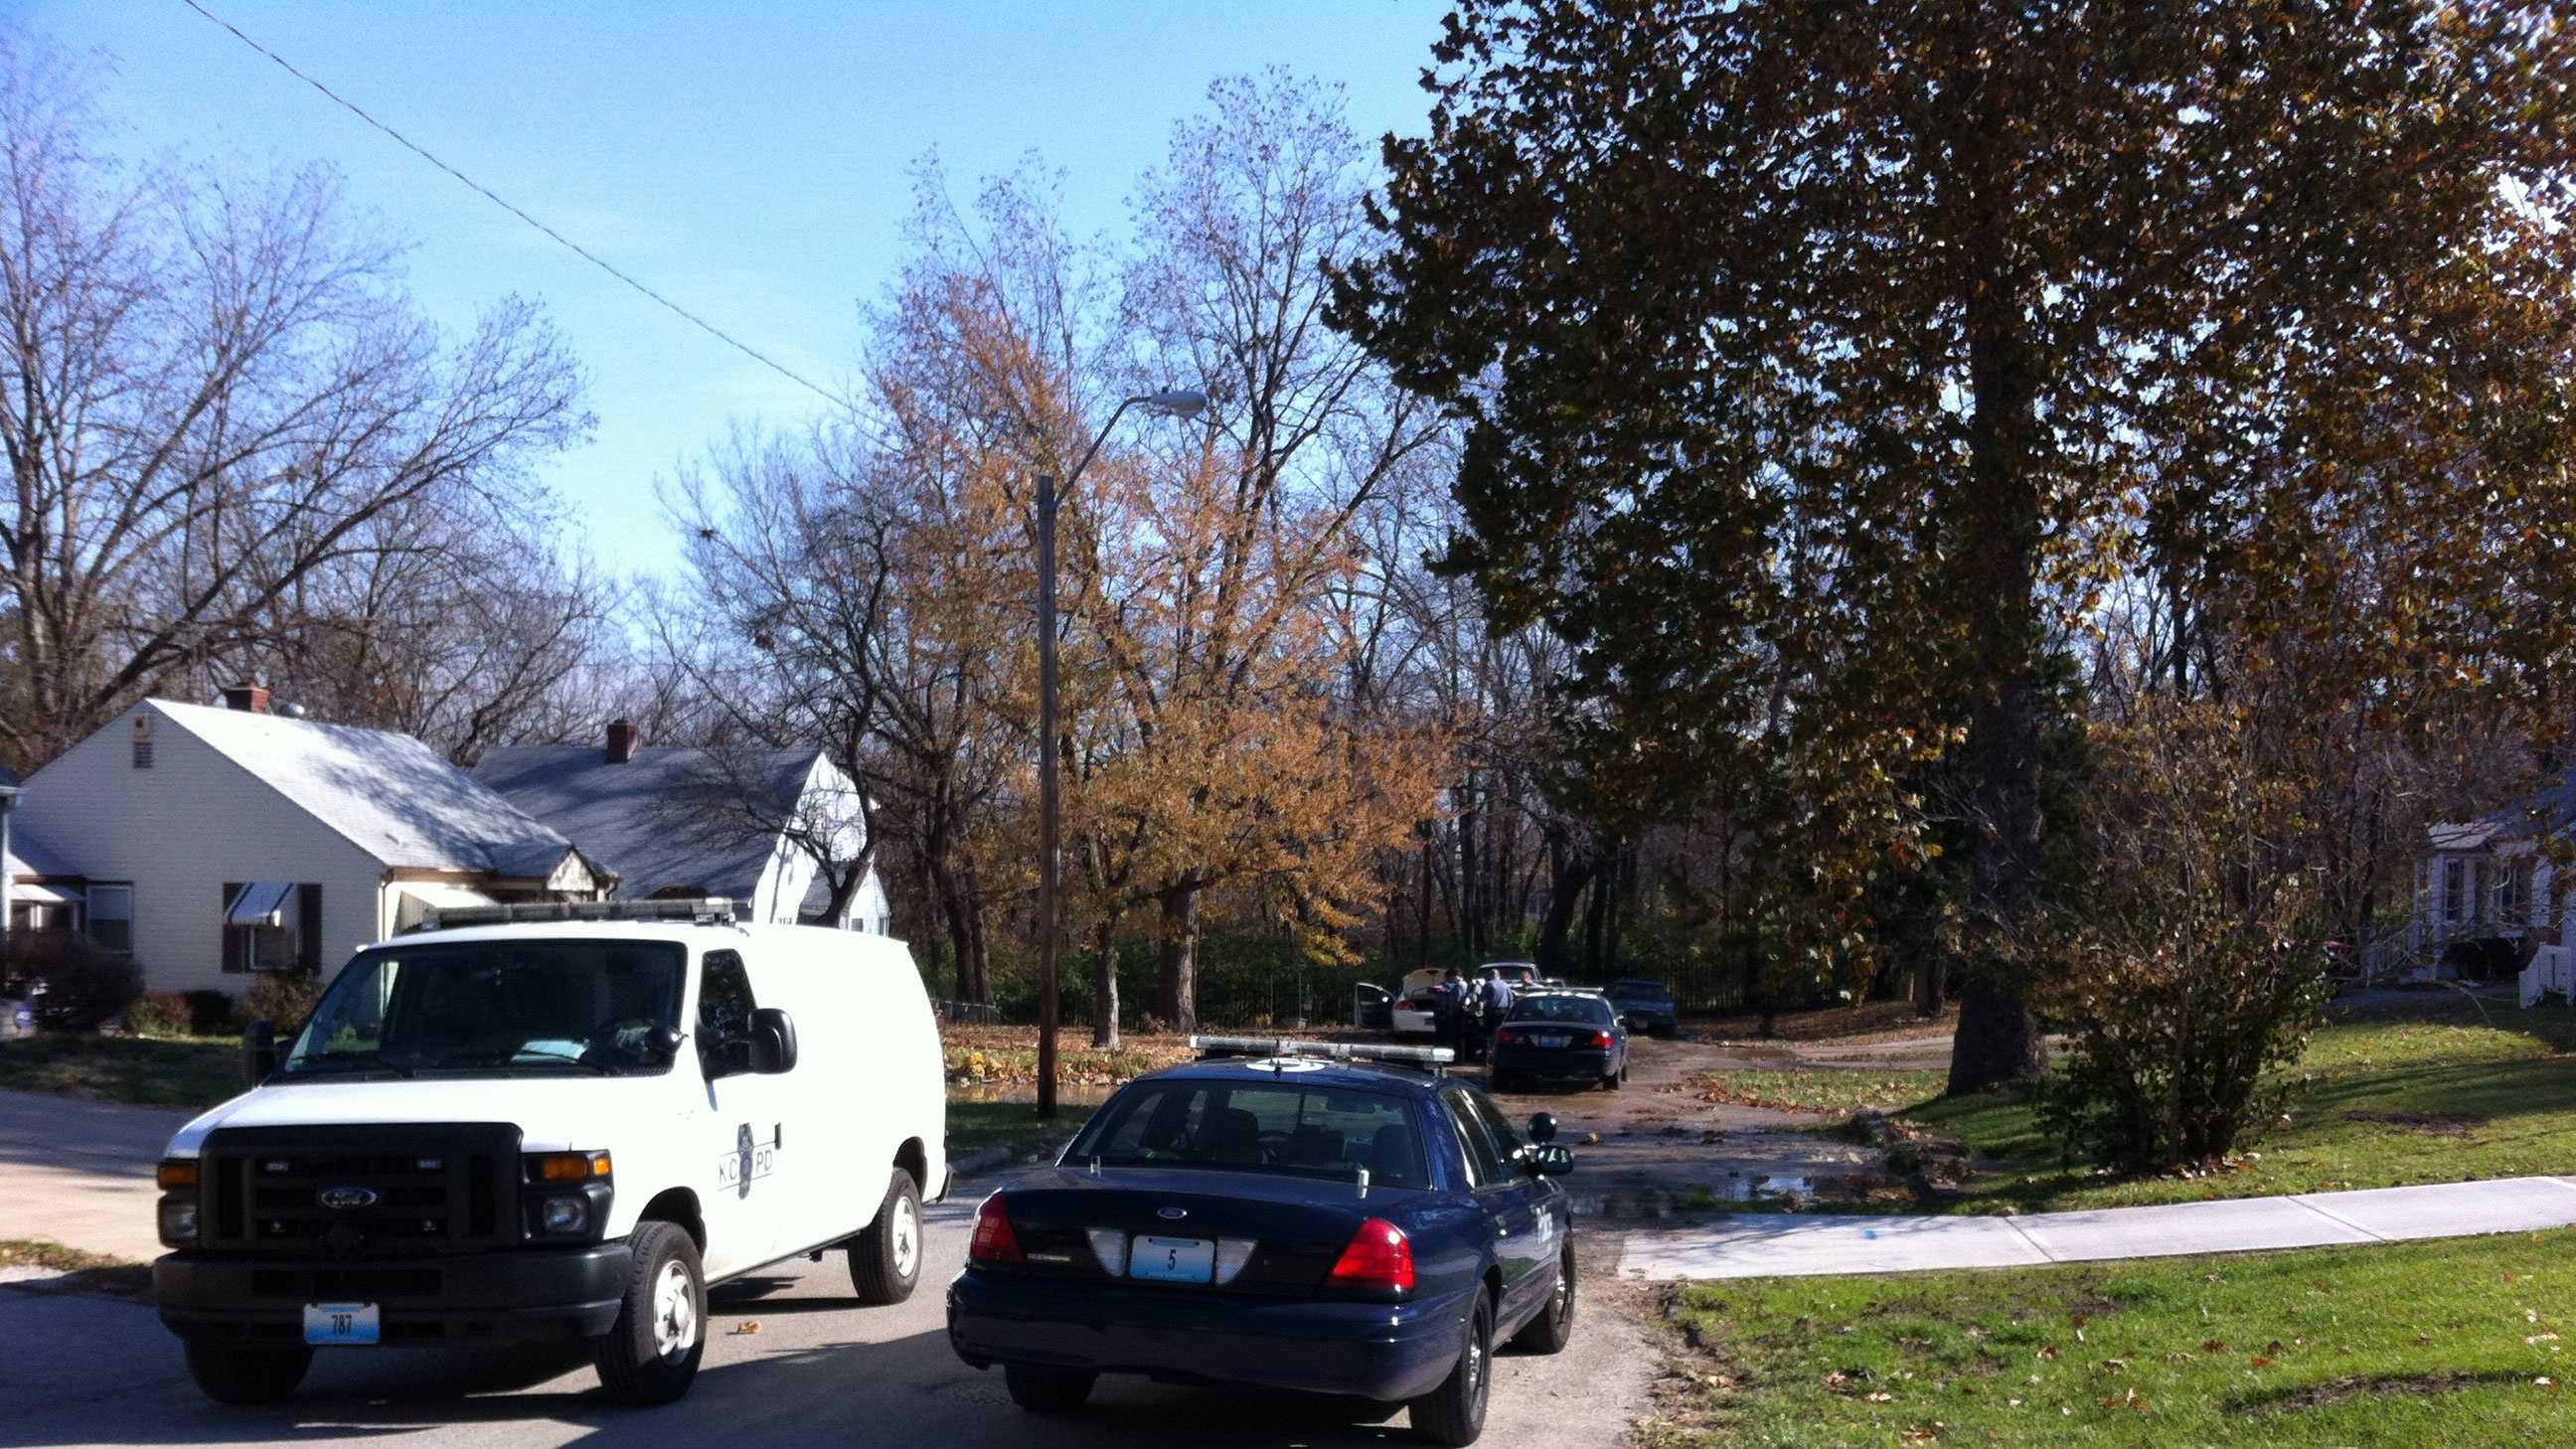 67th Terrace, Jackson police pursuit